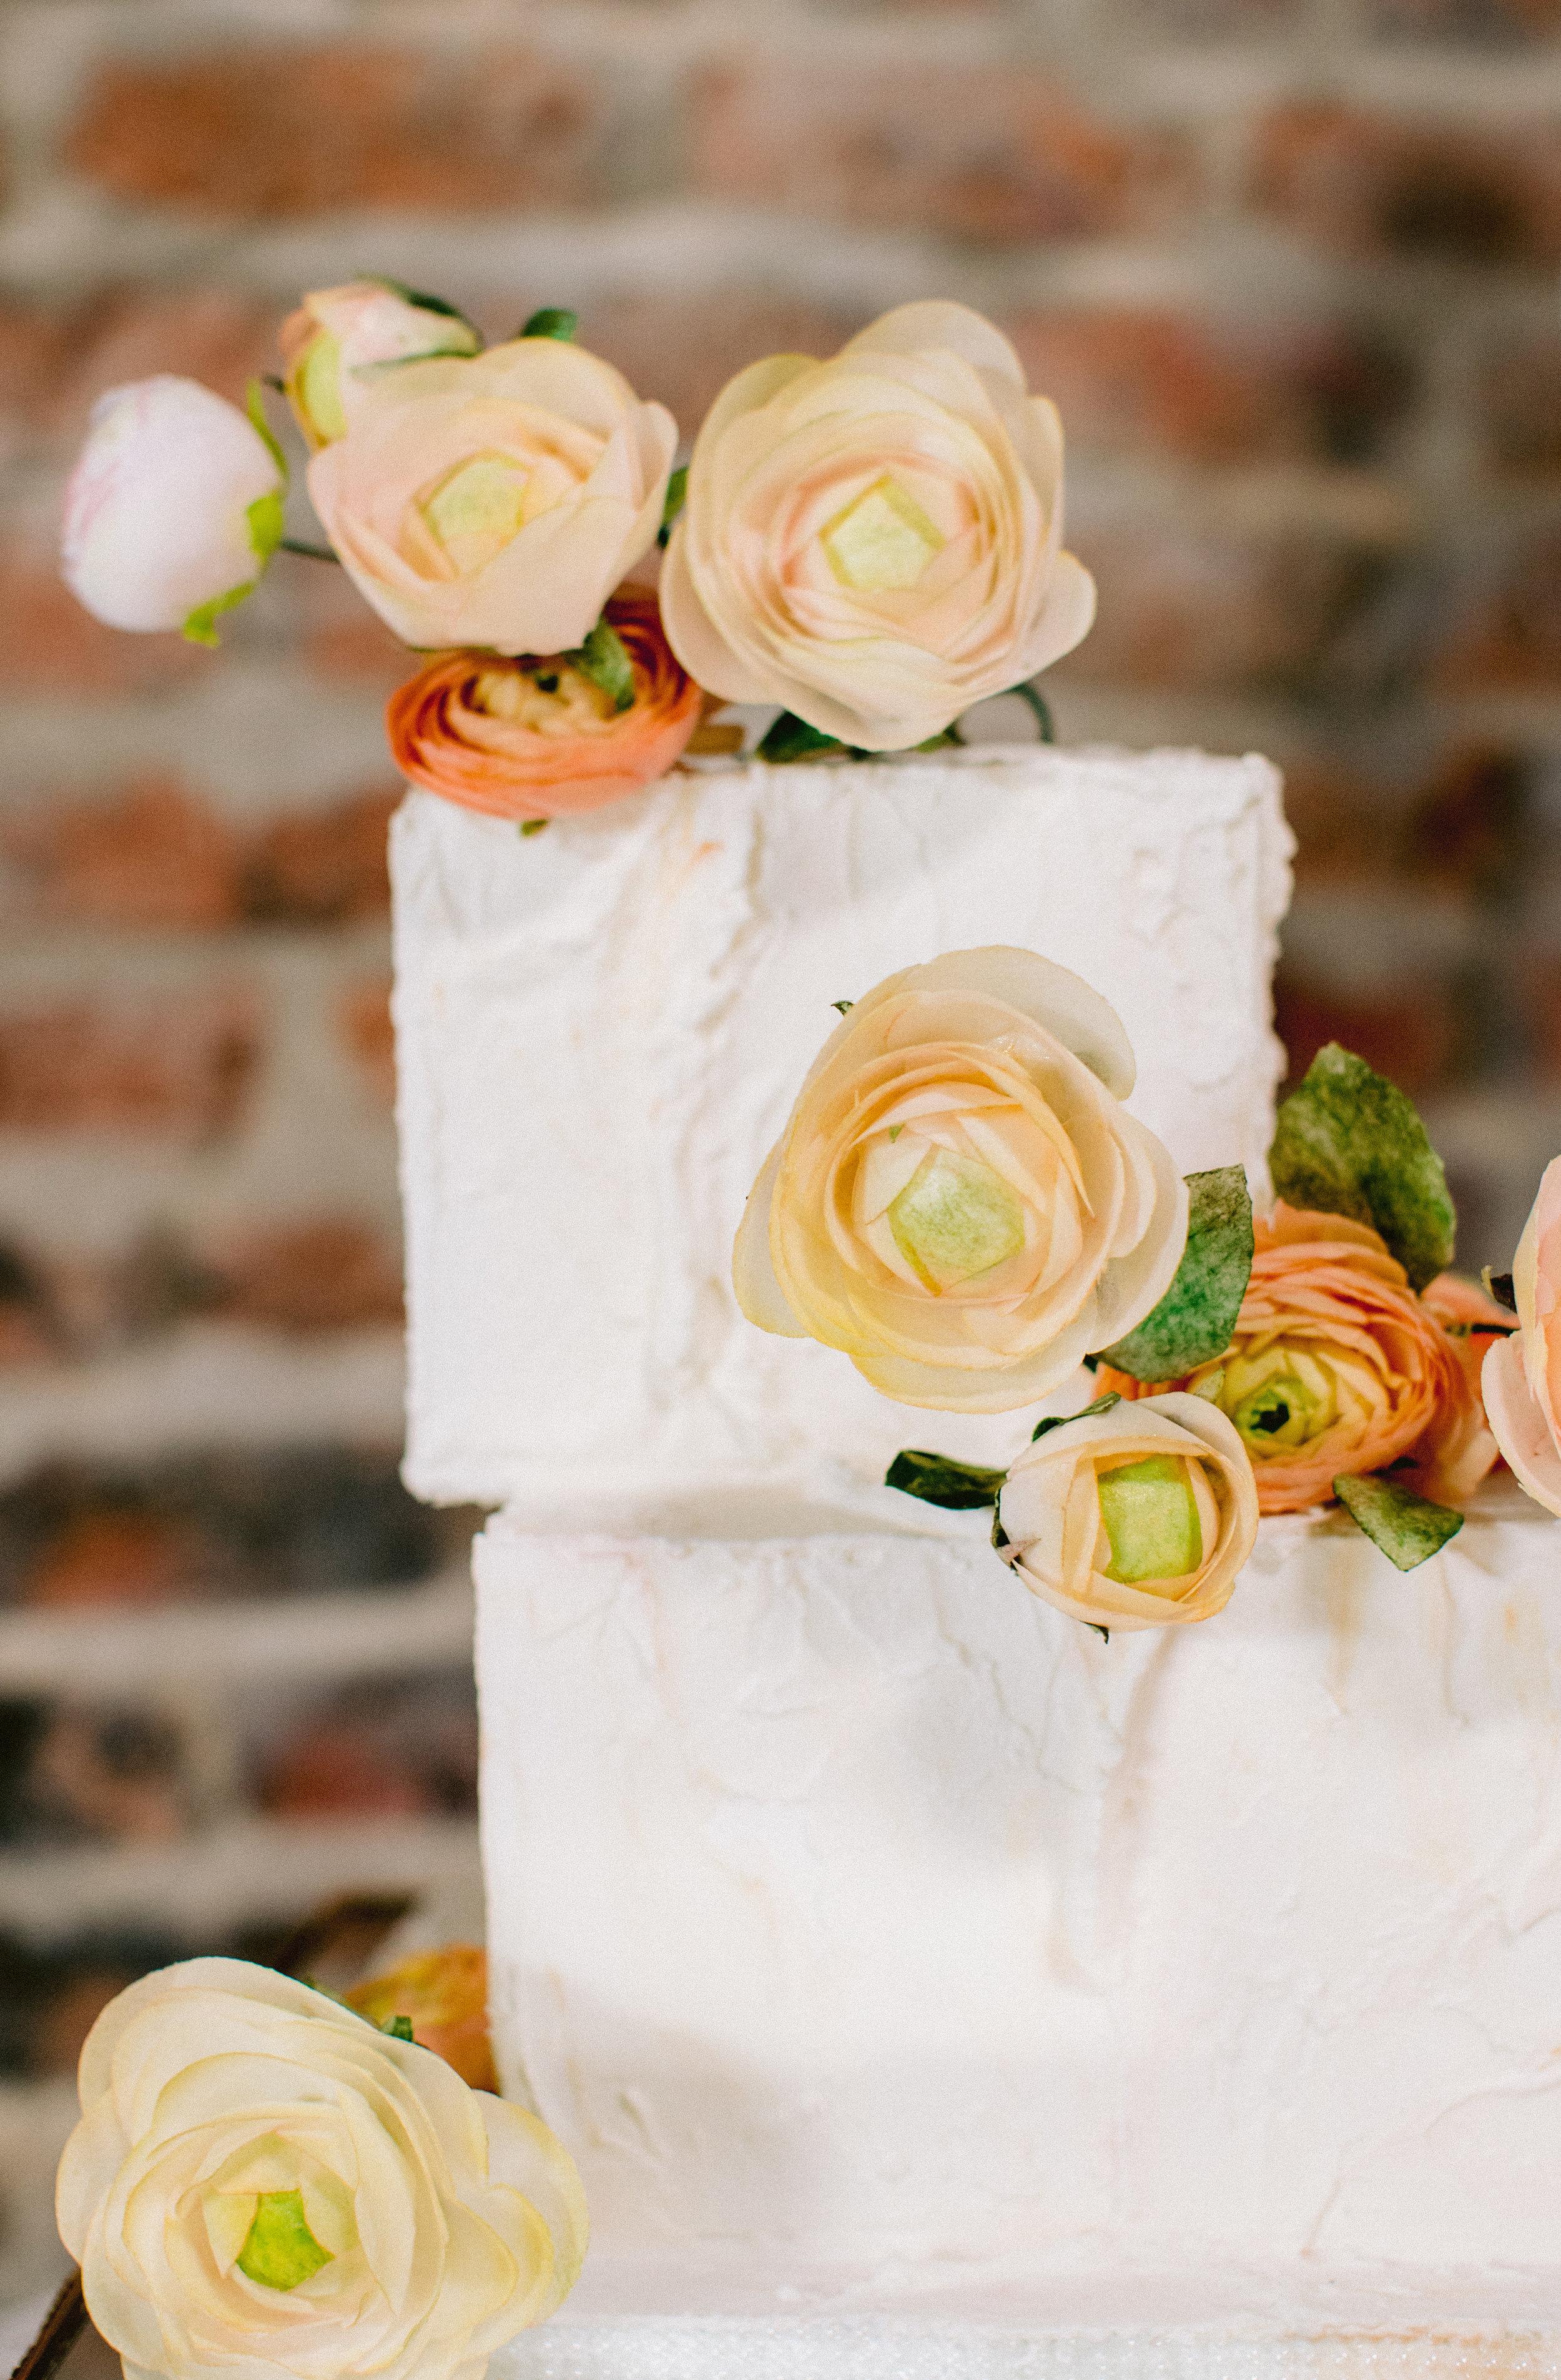 New Orleans all-inclusive wedding venue